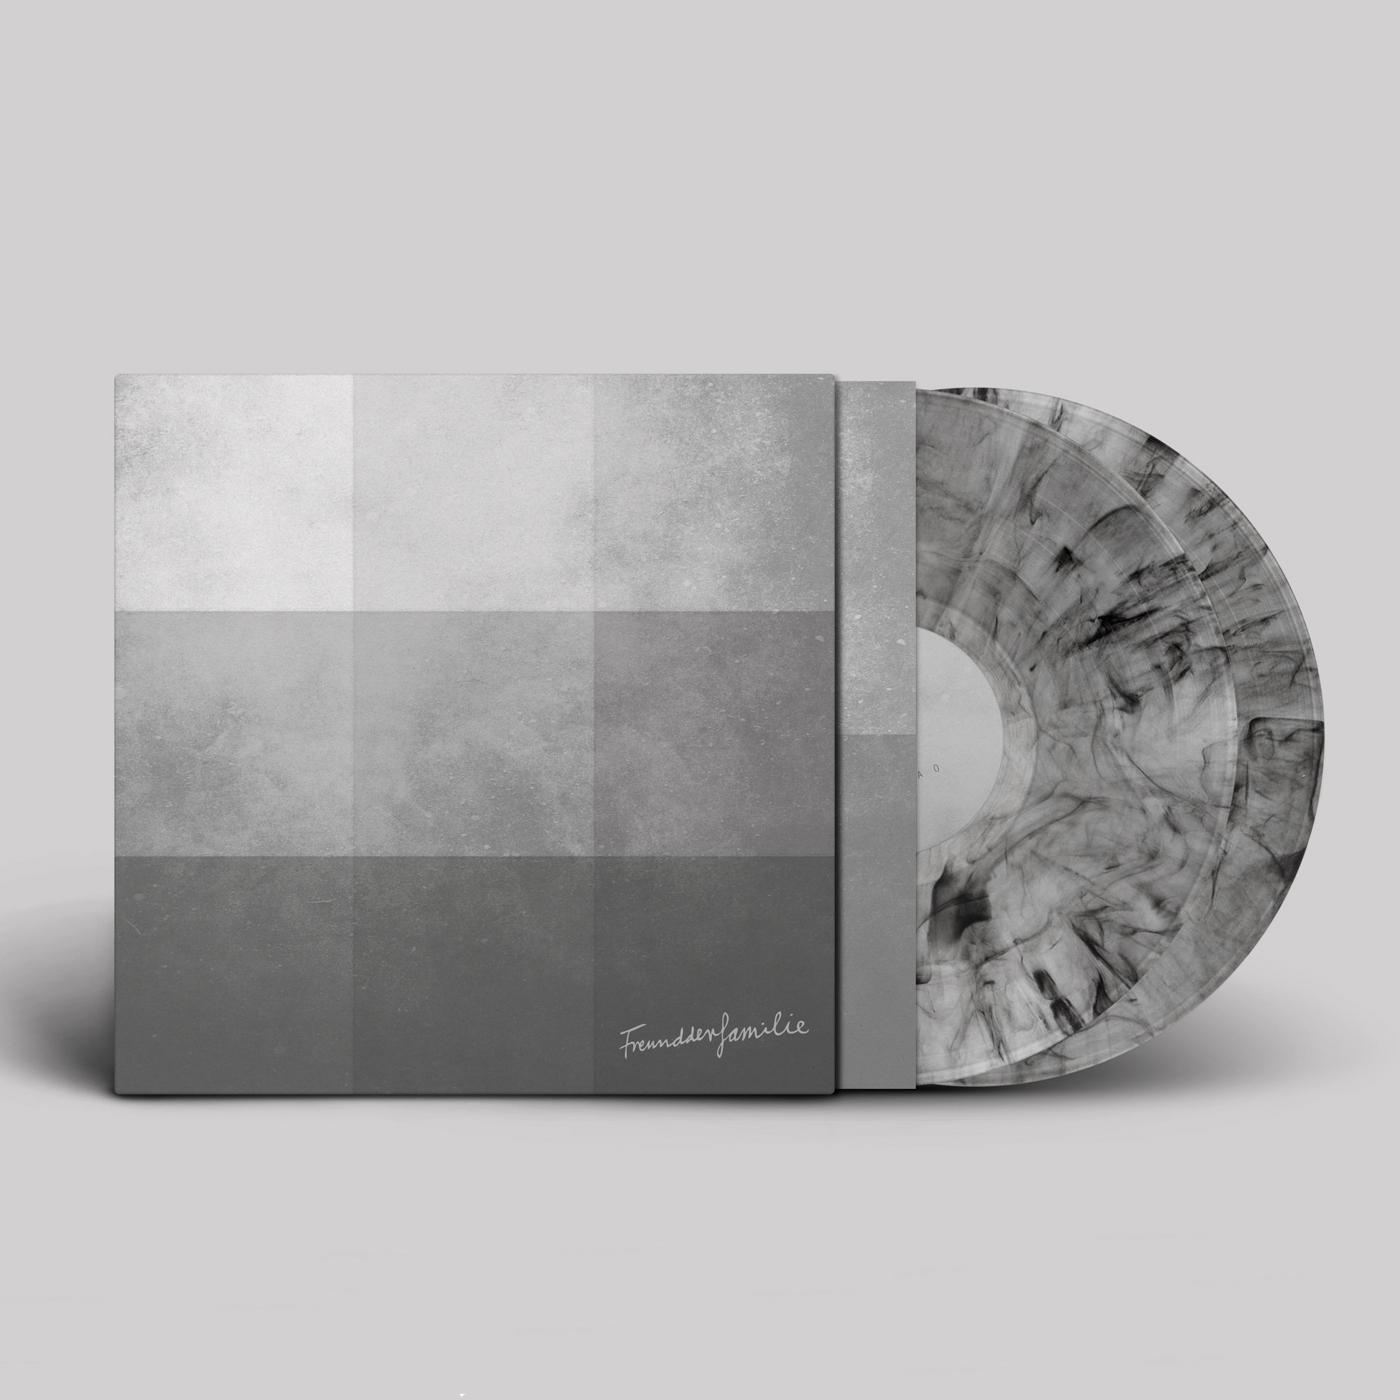 Grau 1 (Concrete Versions)